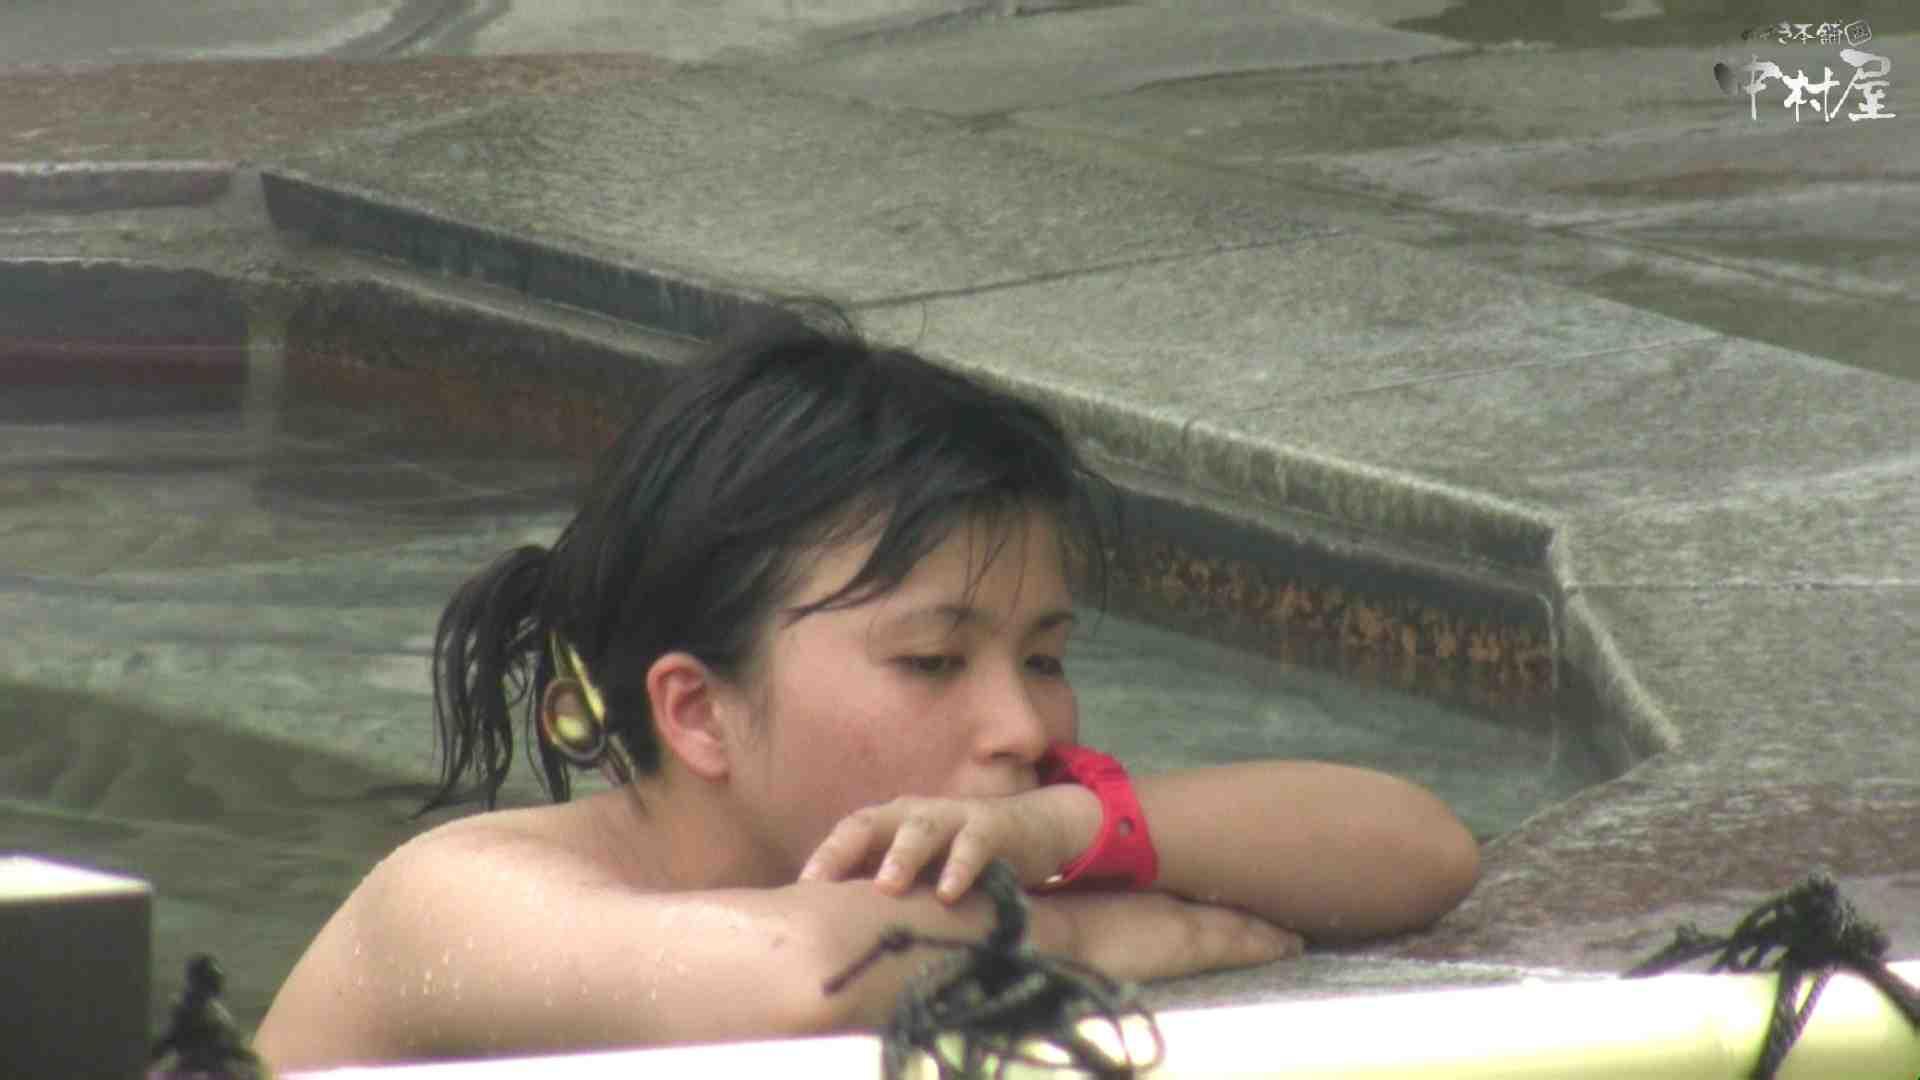 Aquaな露天風呂Vol.894 盗撮シリーズ | 露天風呂編  85PIX 73